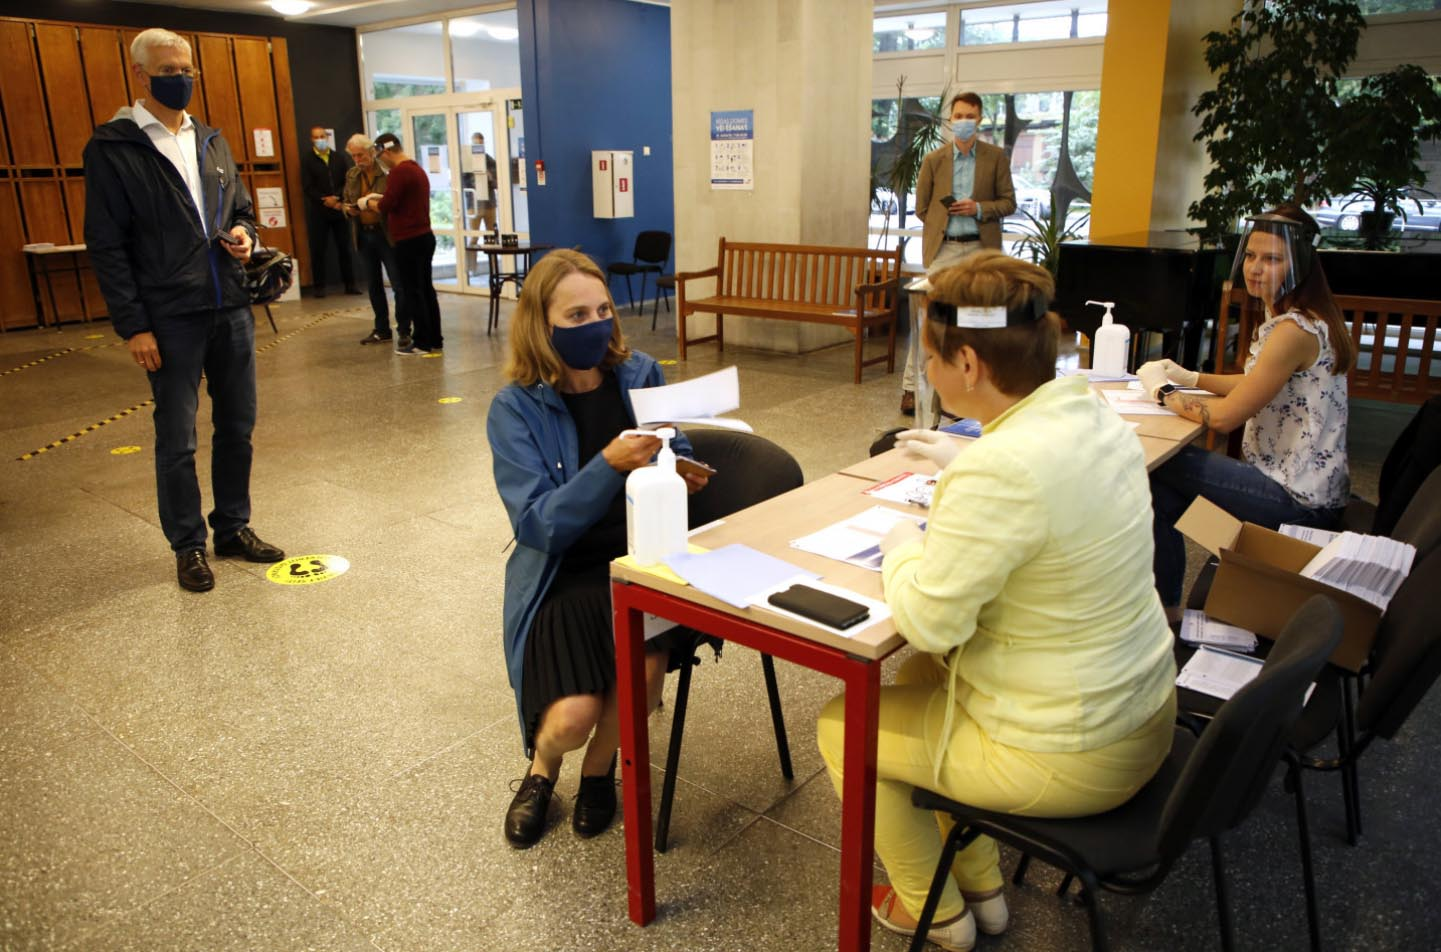 Inside a polling station.